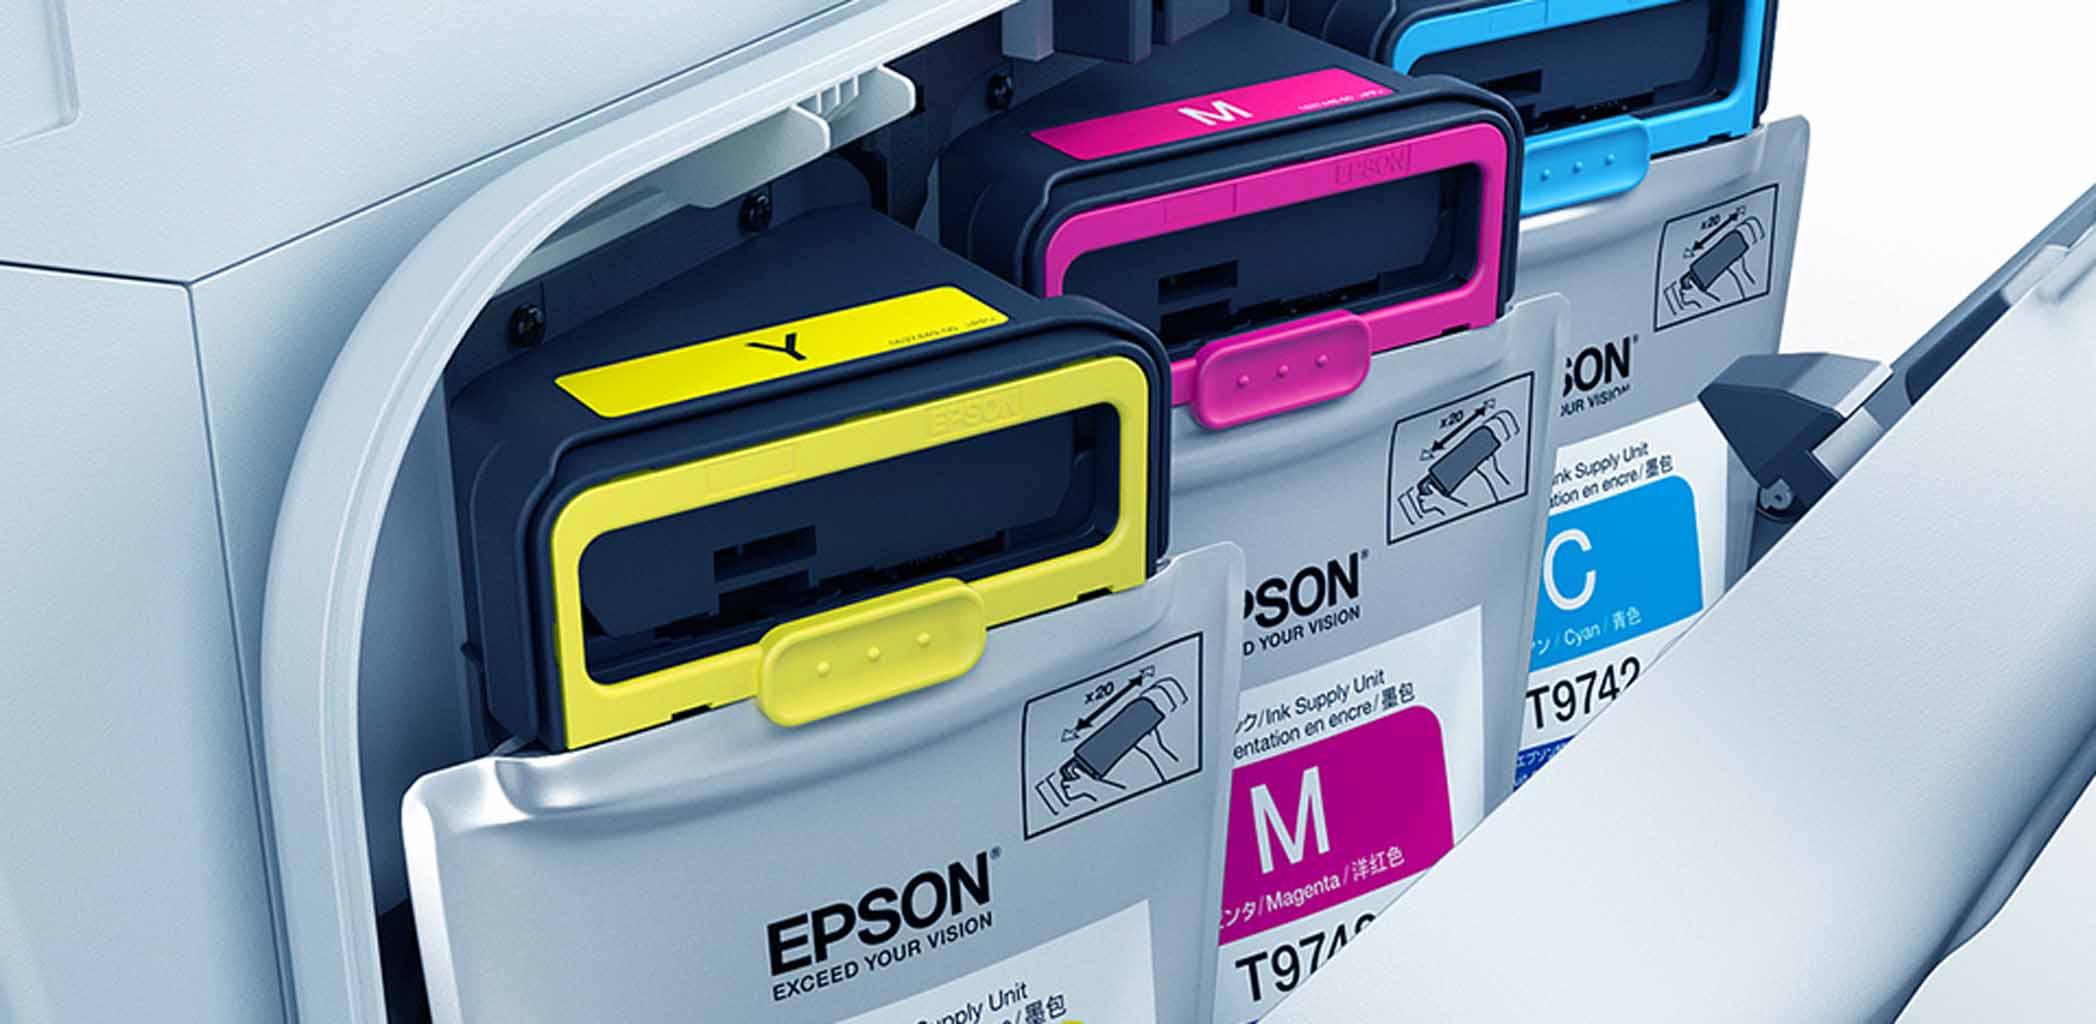 Printer-cartridge